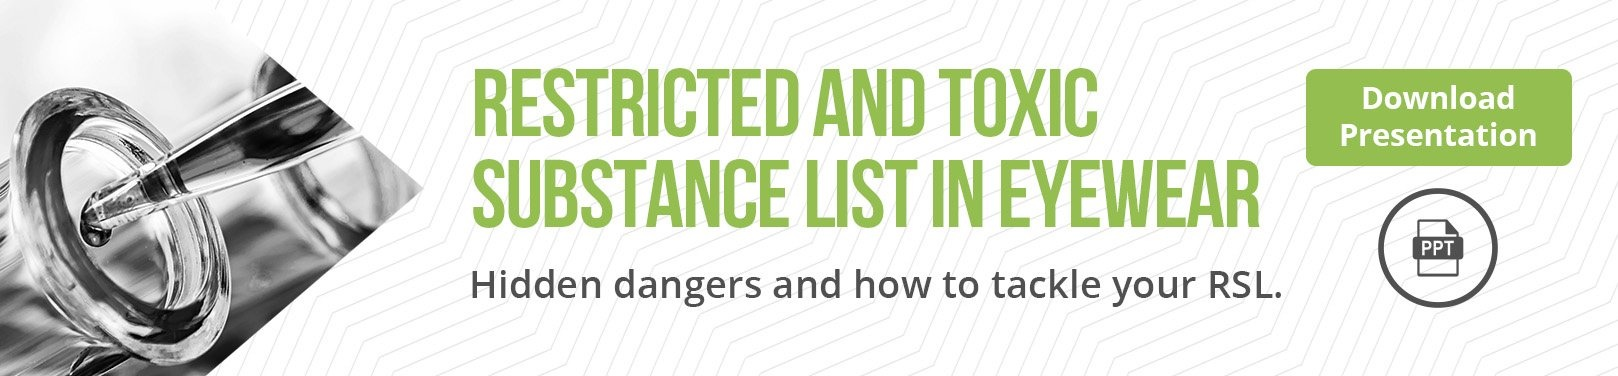 Restricted substance list